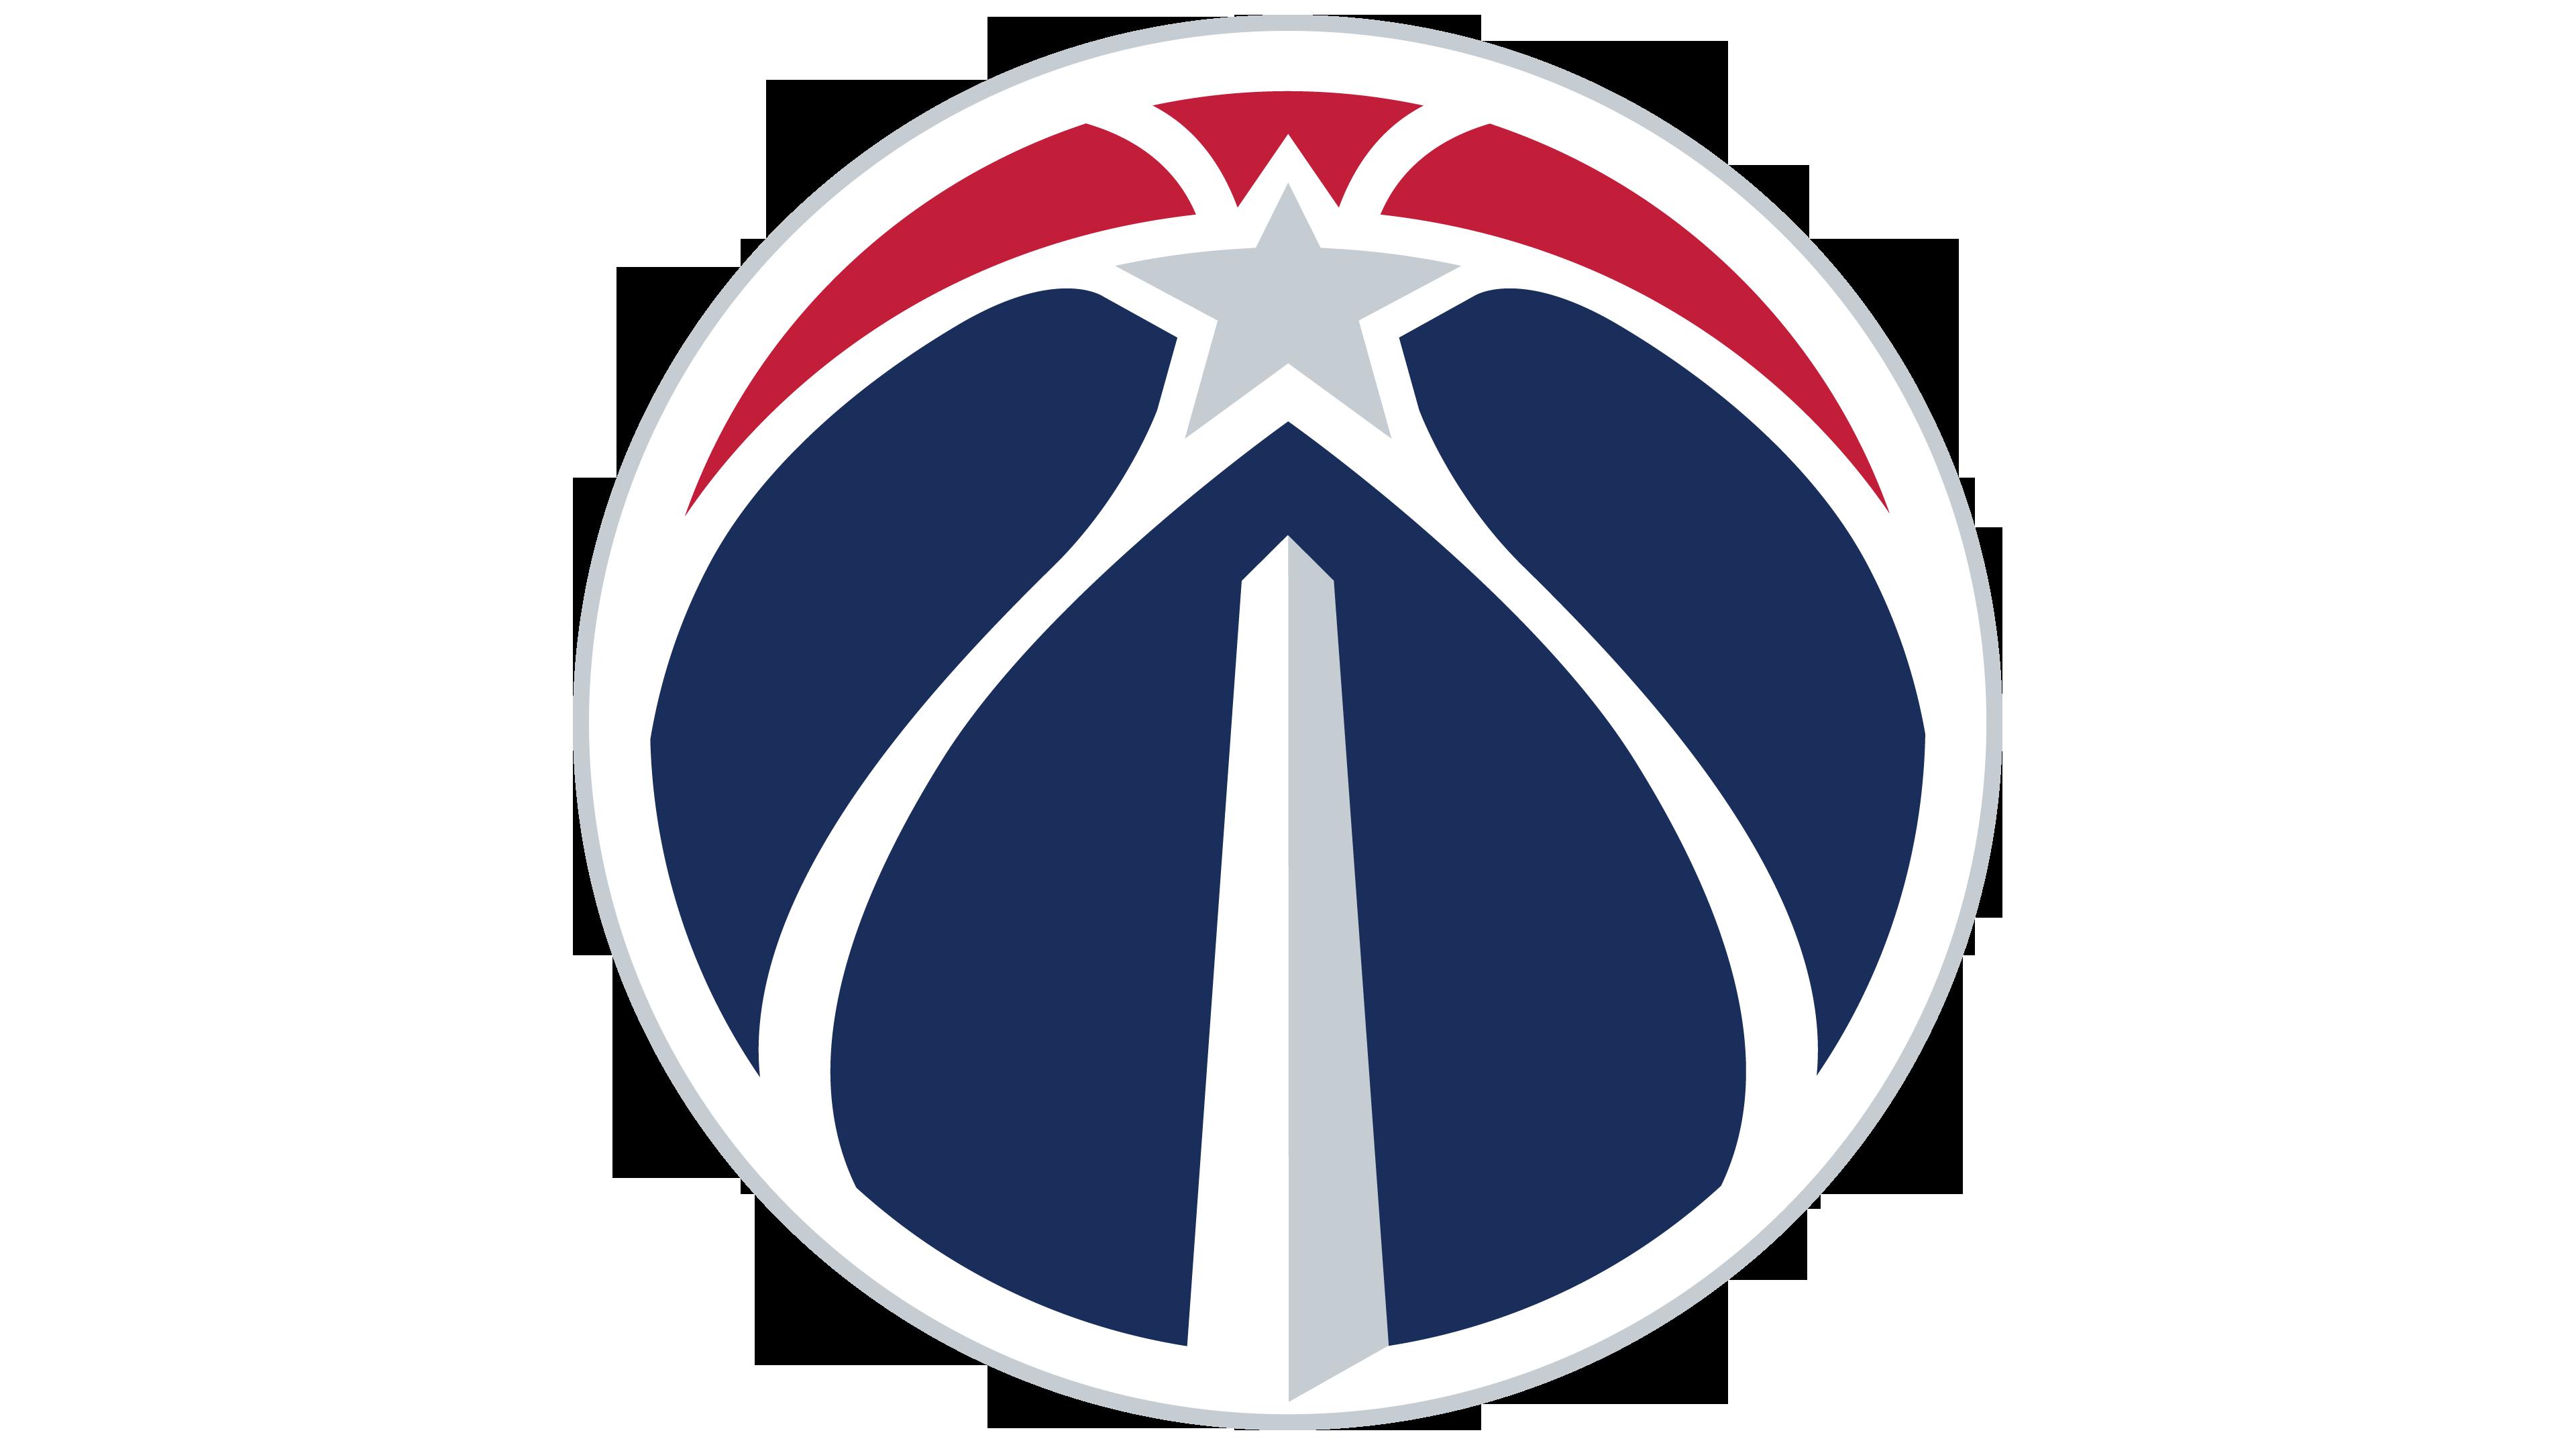 Washington Wizards logo.